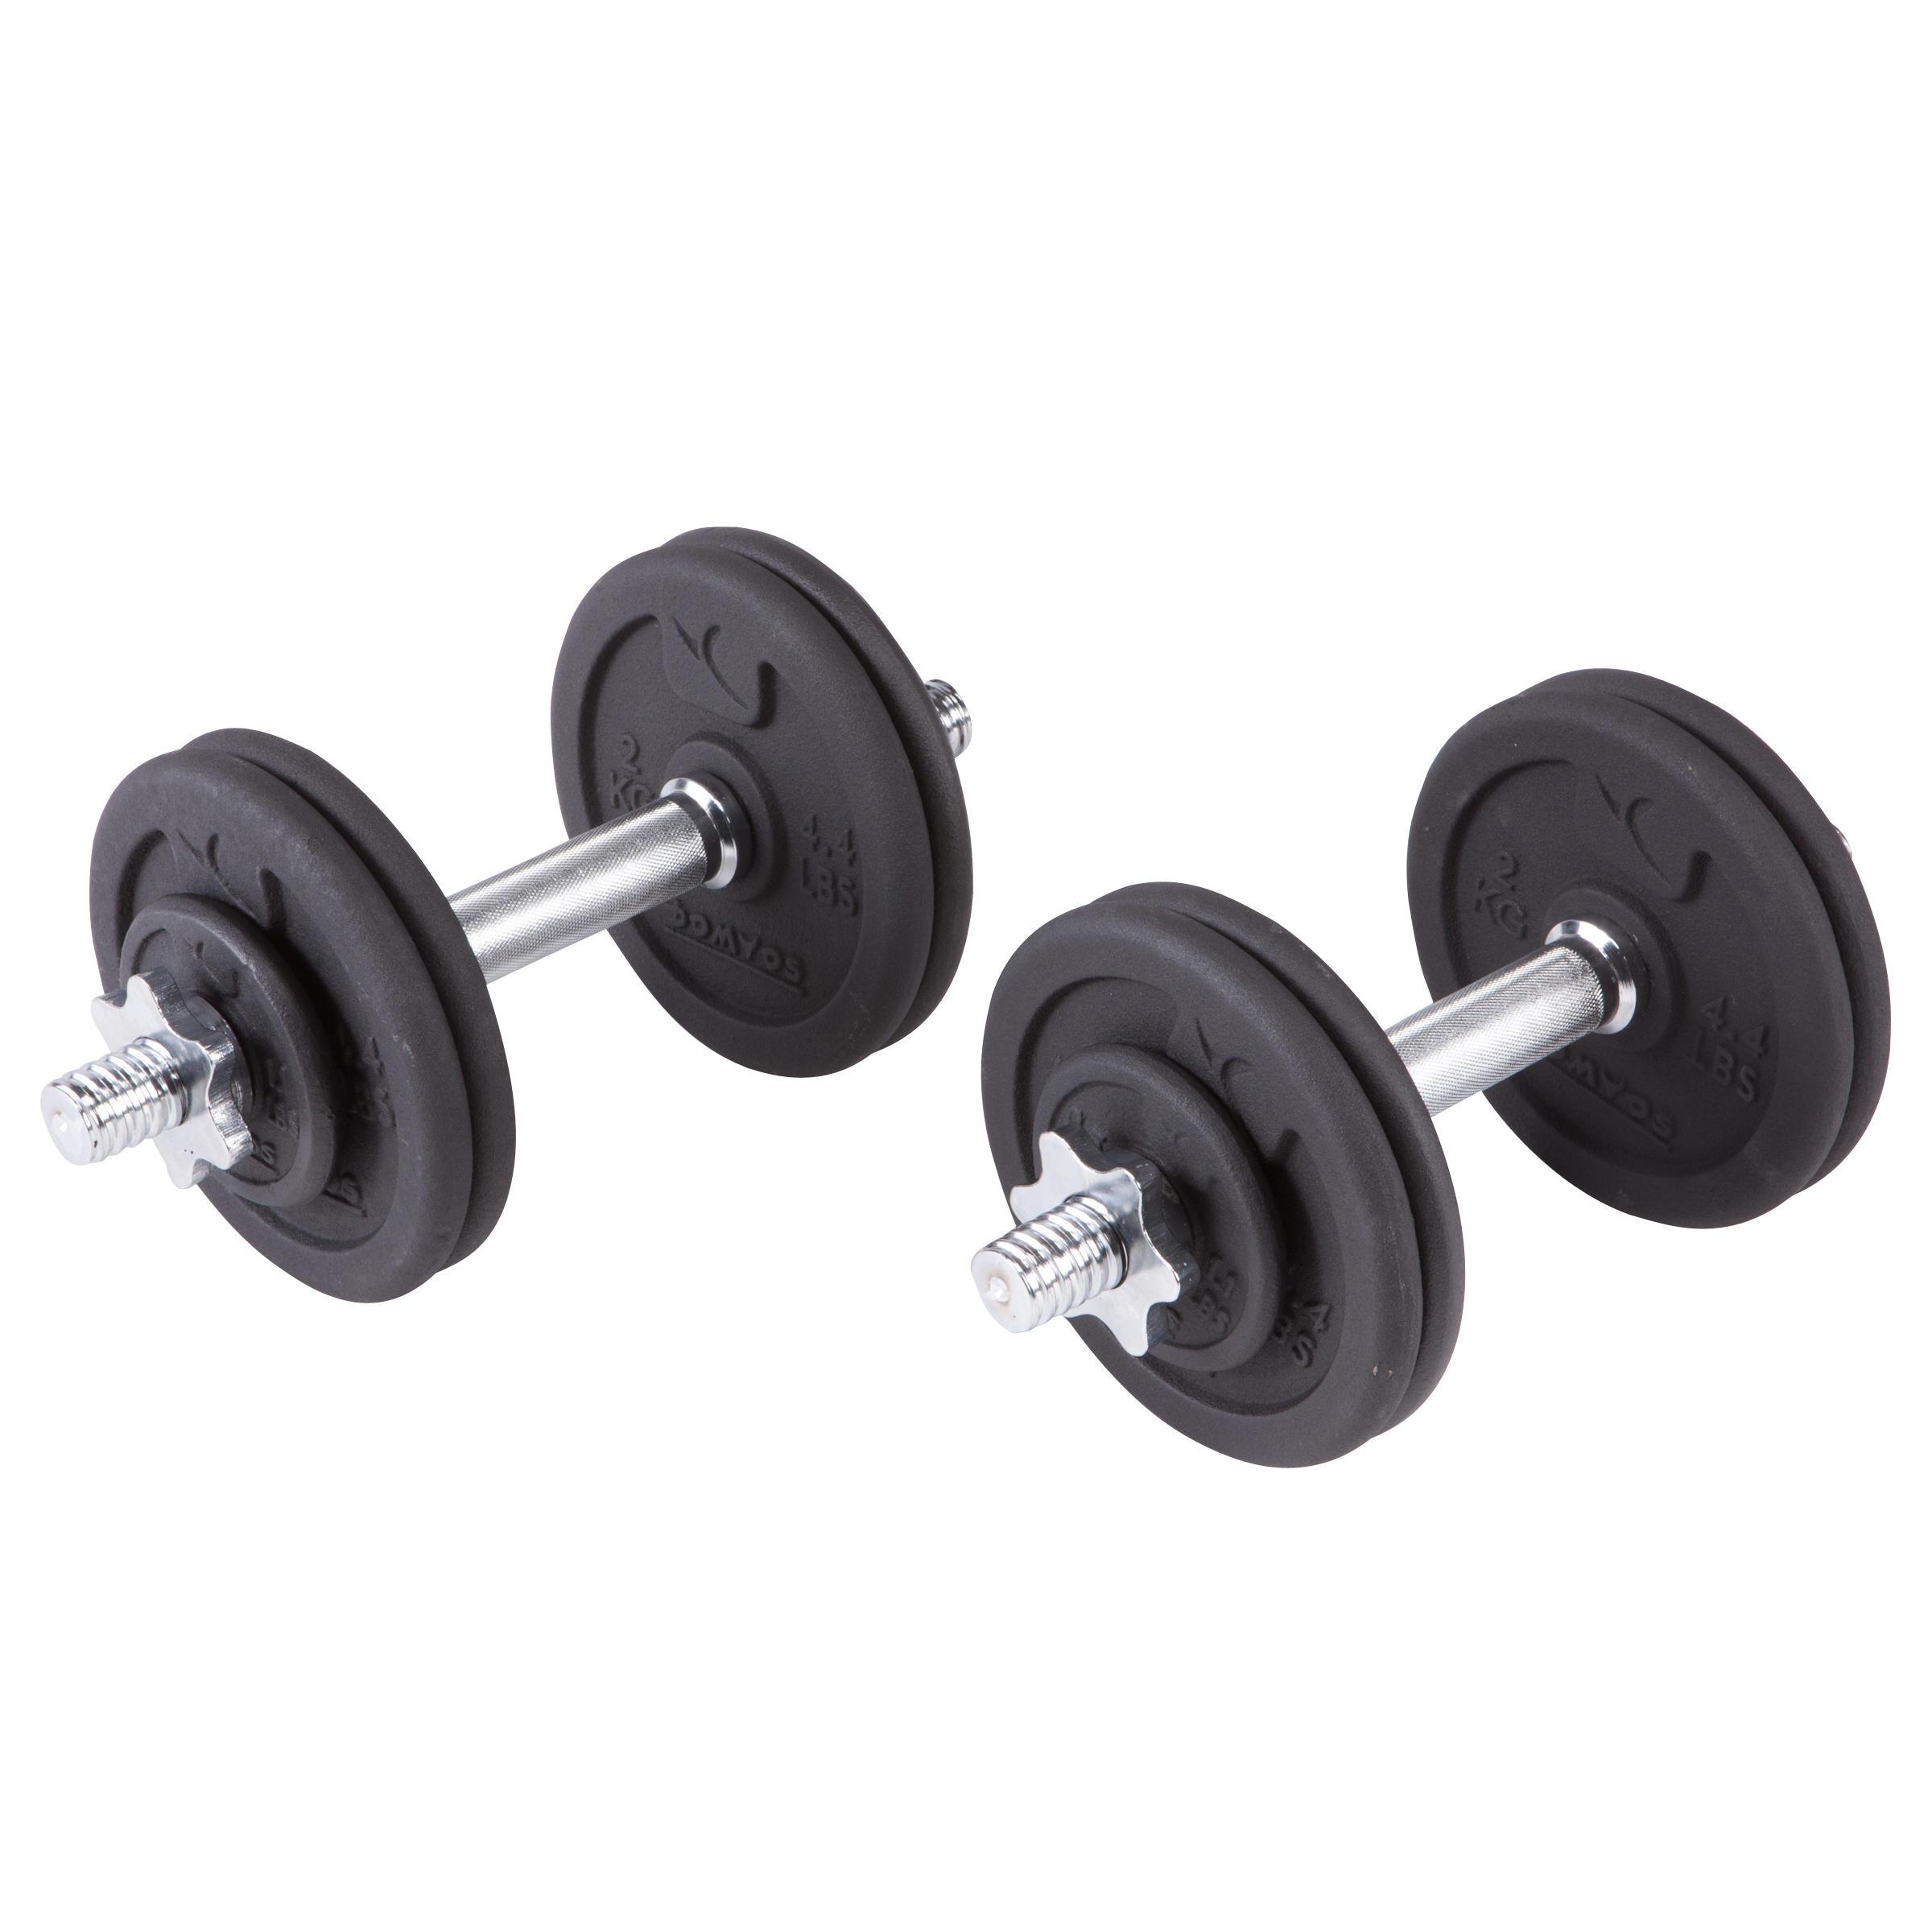 Weight Training Weight Kit 50kg